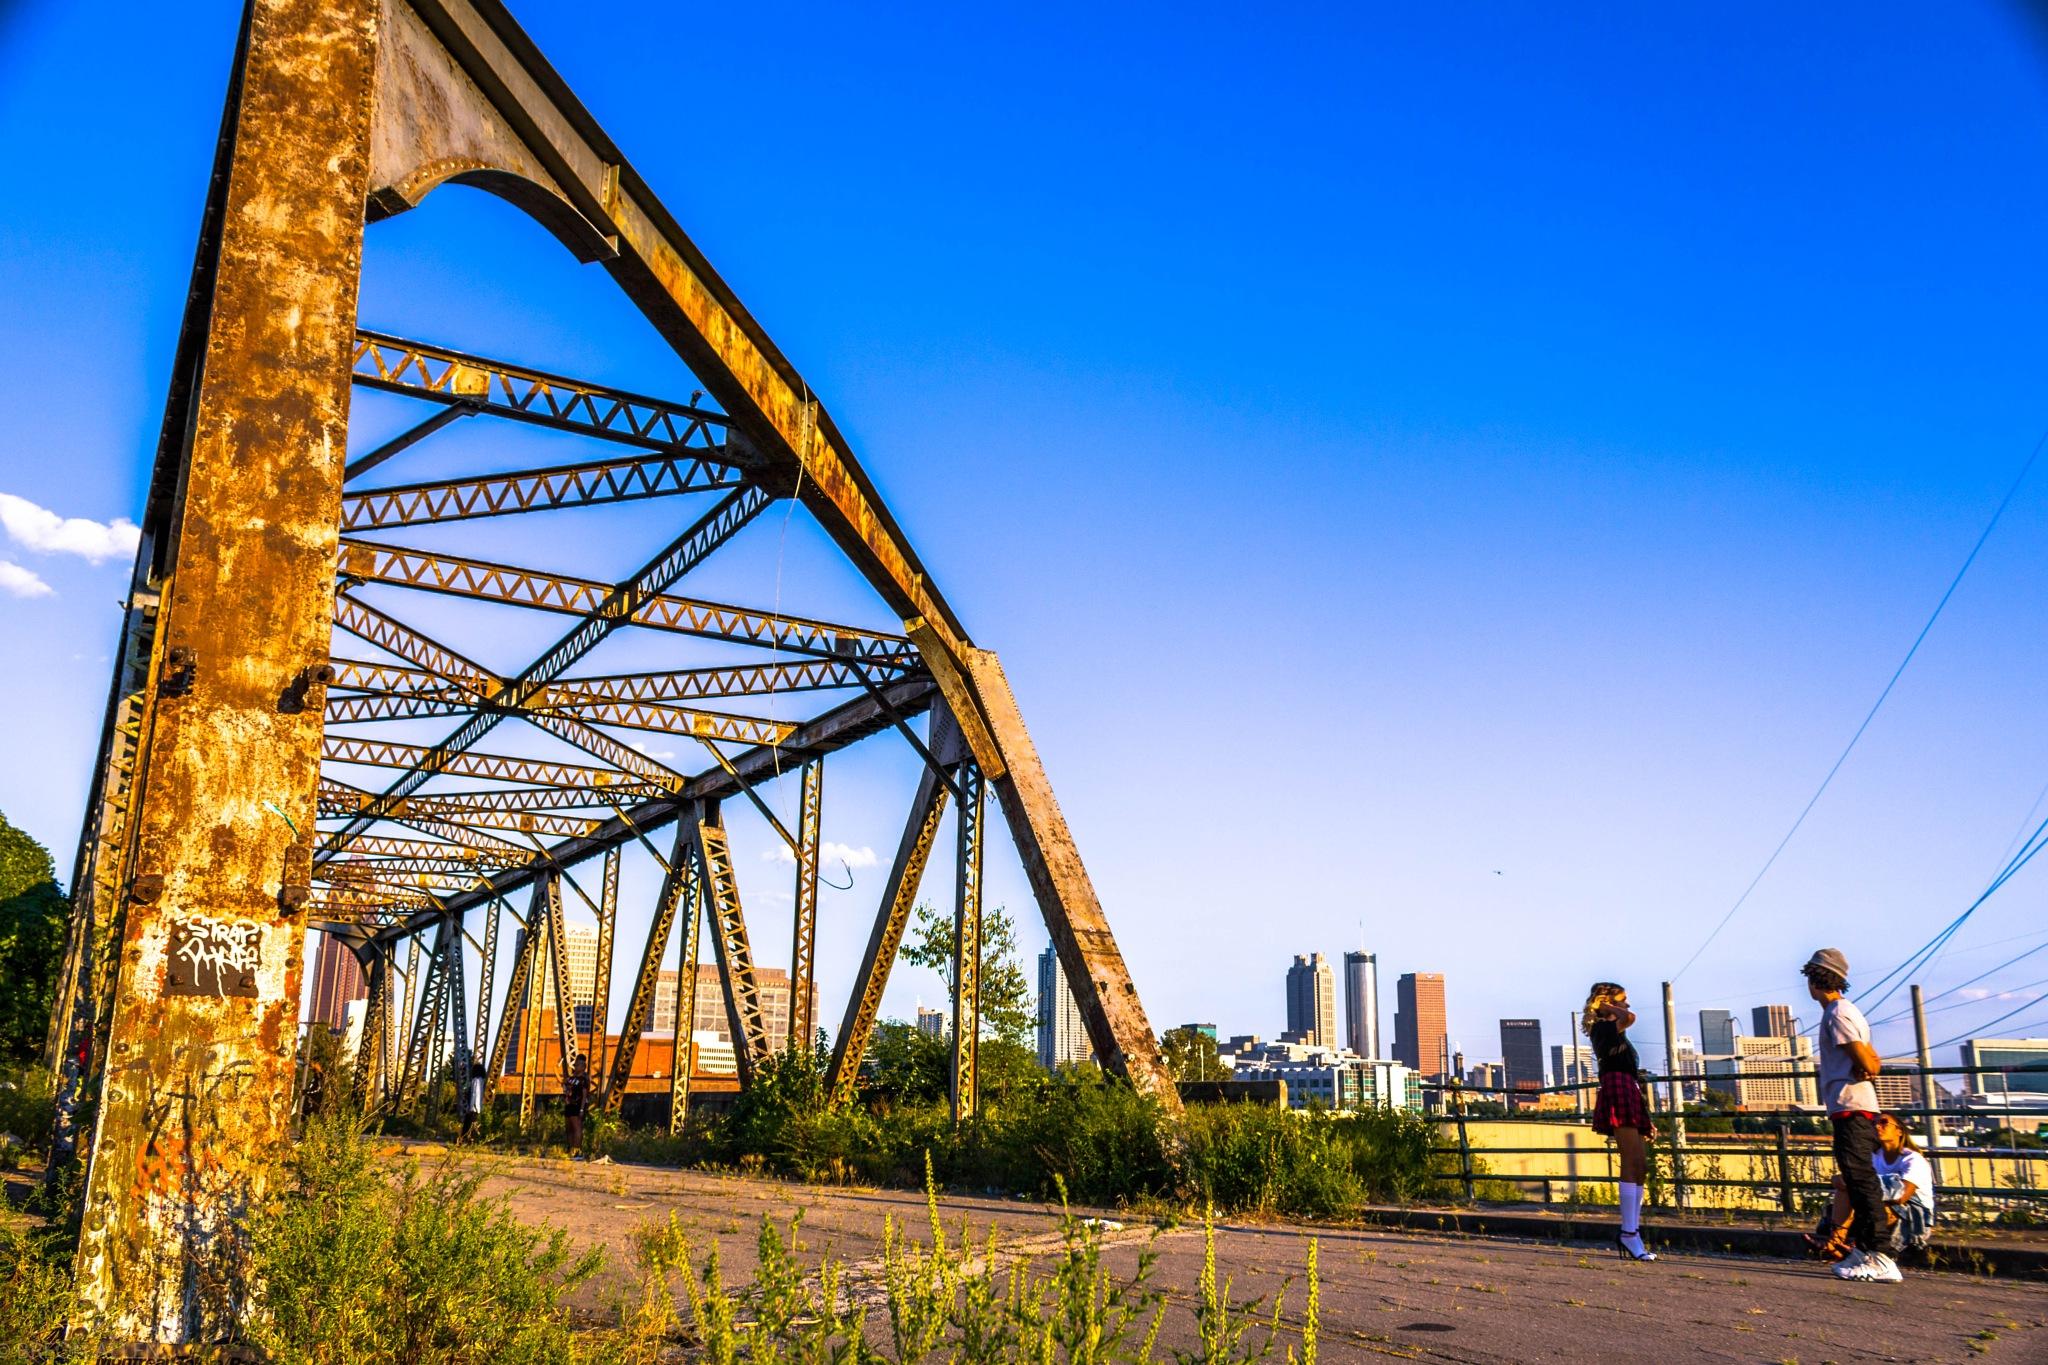 bridge to nowhere by Breon allen